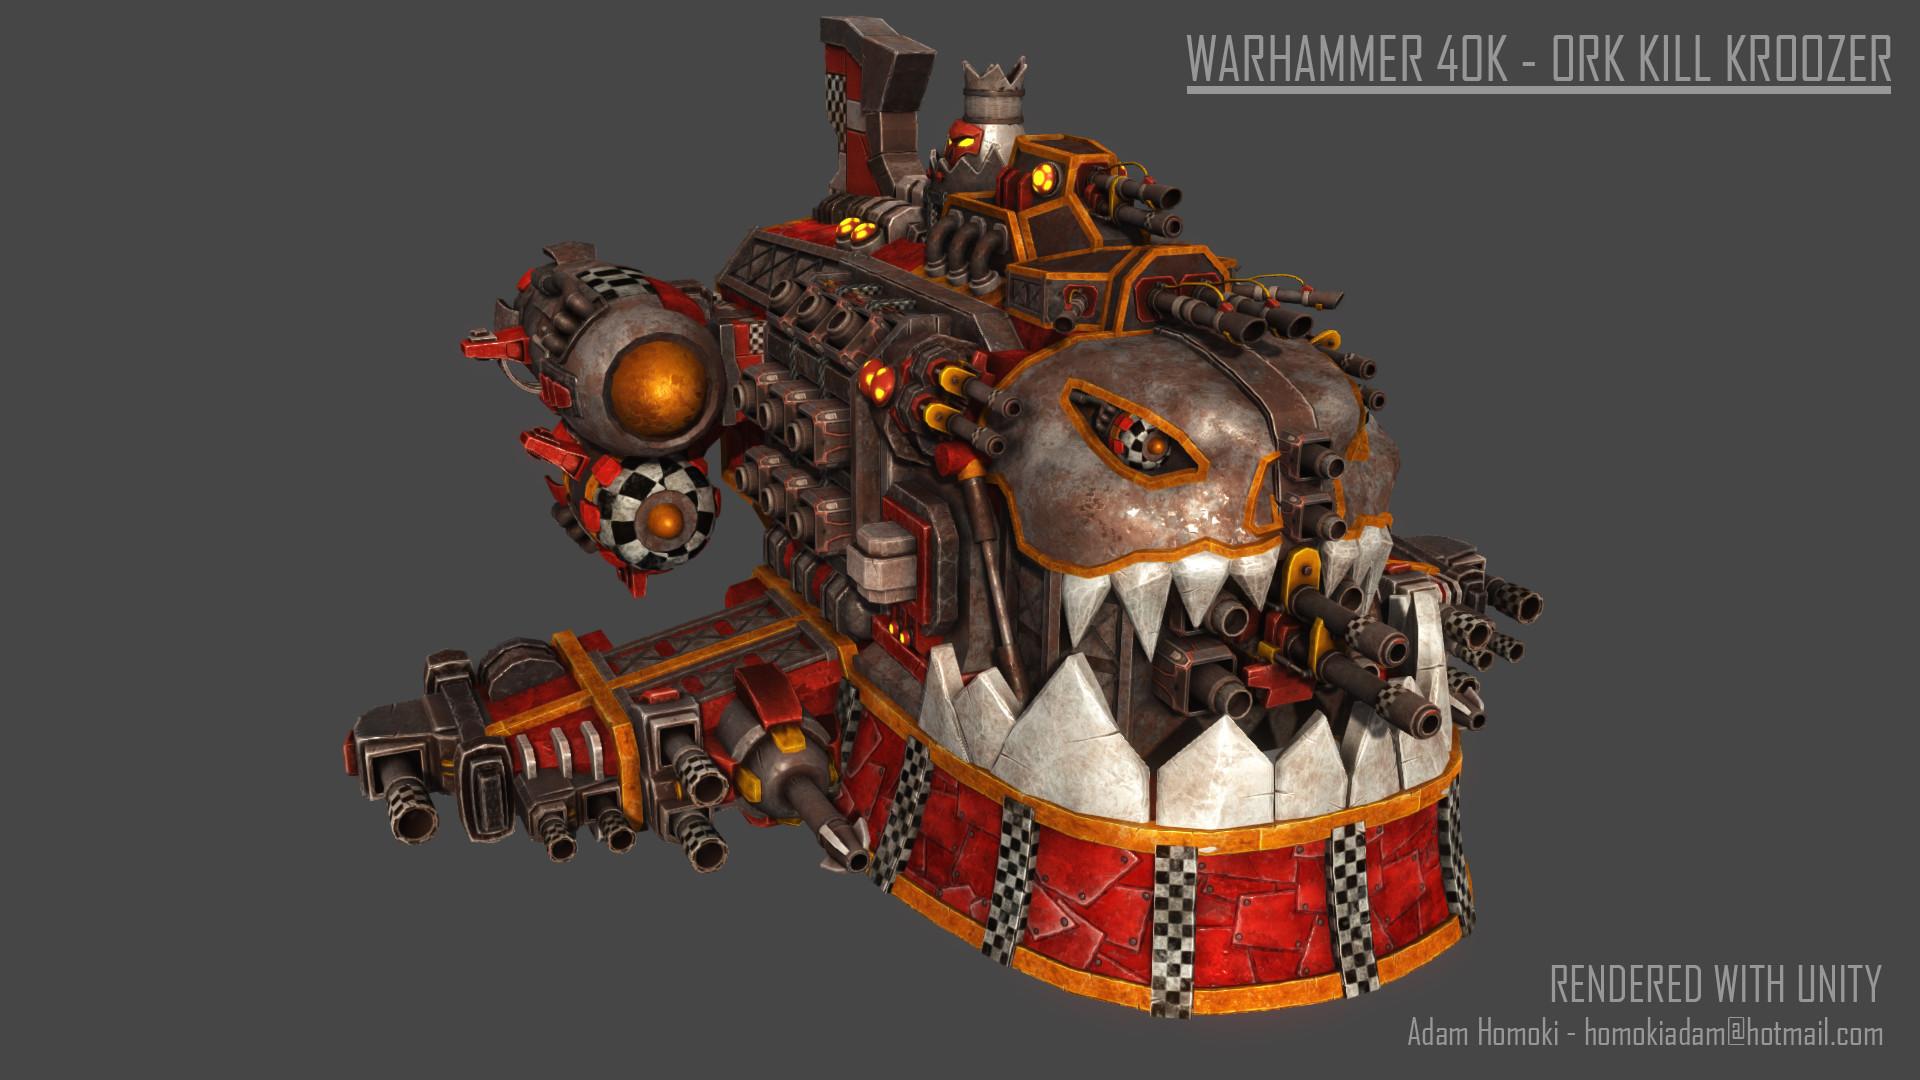 Warhammer 40K – Ork Kill Kroozer